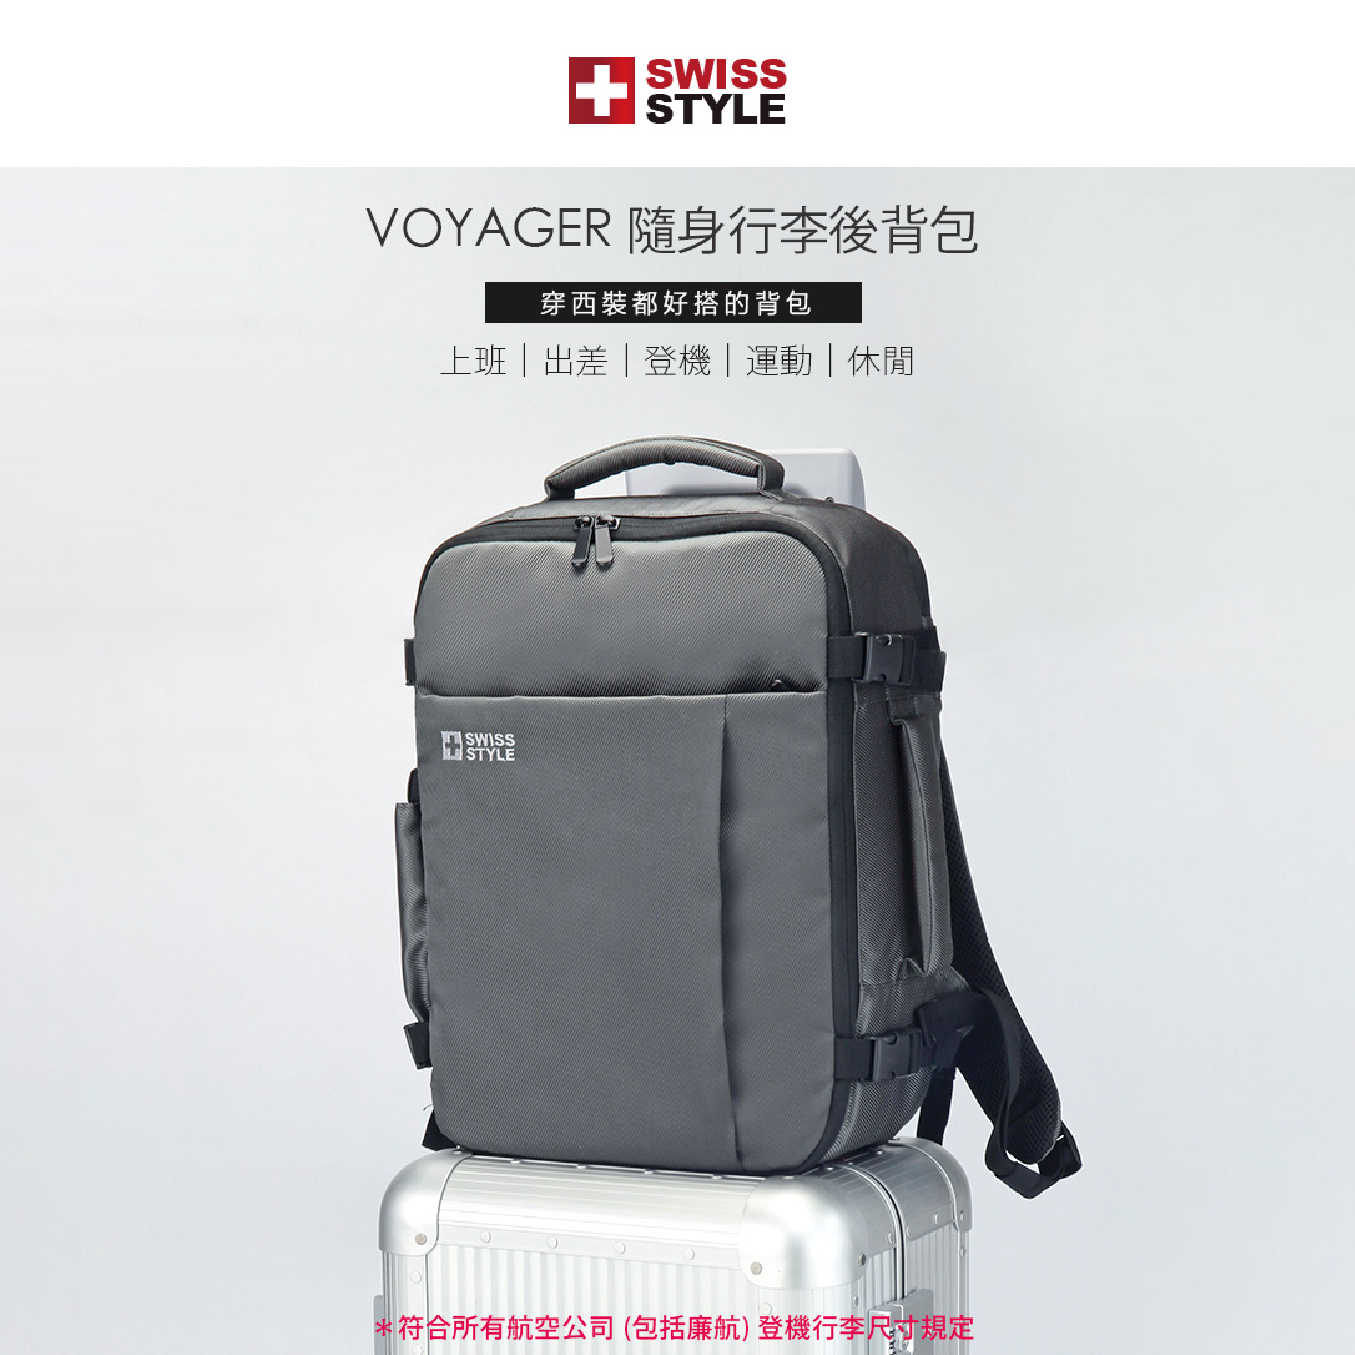 SWISS STYLE 隨身行李後背包 筆電包 旅行包 肩背包 減壓設計(黑/墨綠) 登機行李箱